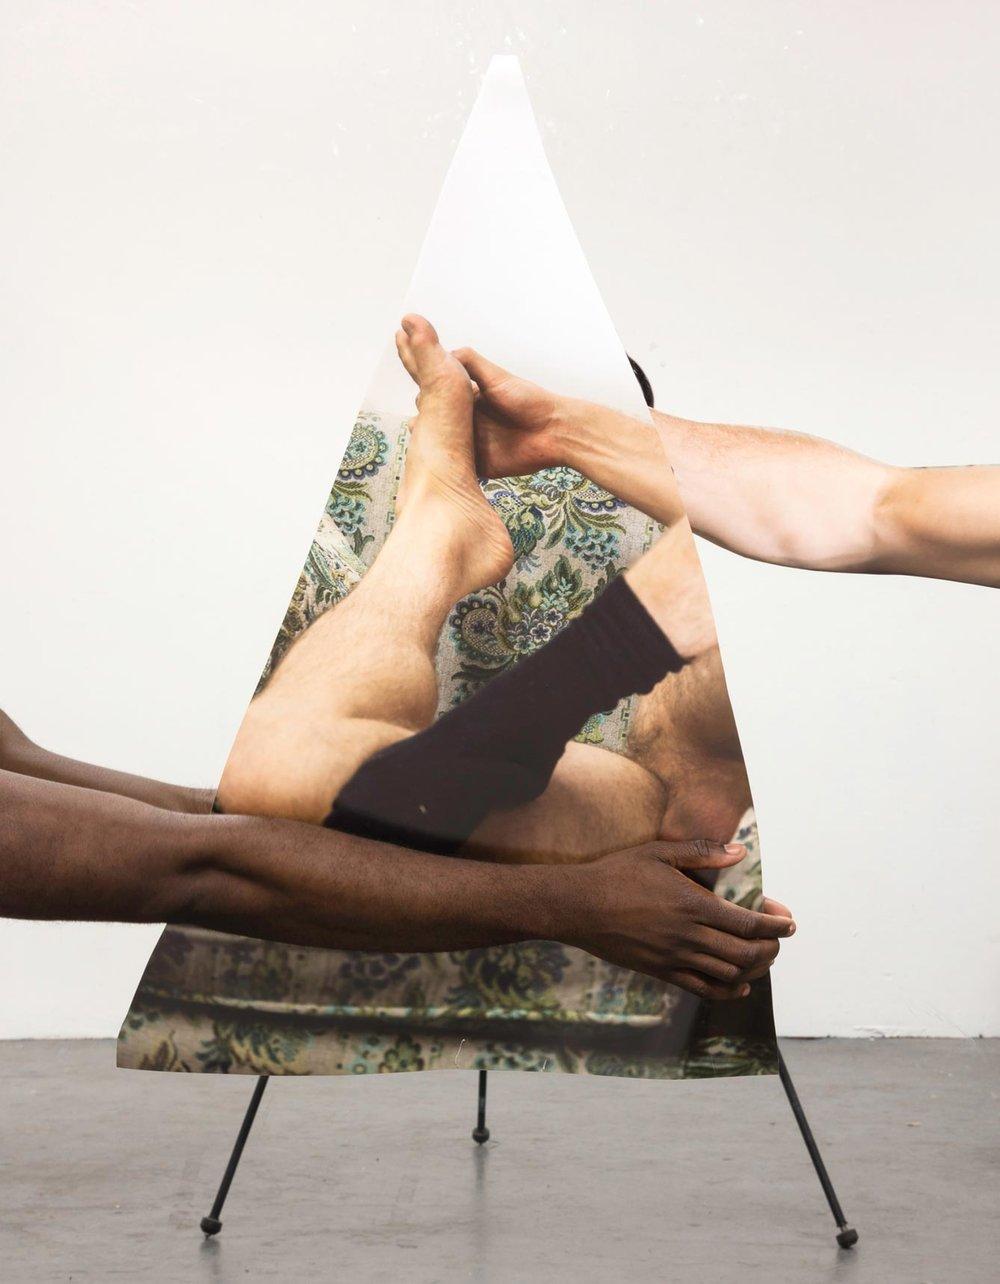 Paul Mpagi Sepuya  Mirror Study (4R2A0857). 2016. Pigmented inkjet print, 51 × 34′′ (129.5 × 86.4 cm). The Museum of Modern Art, New York. Fund for the Twenty-First Century. © 2017 Paul Mpagi Sepuya